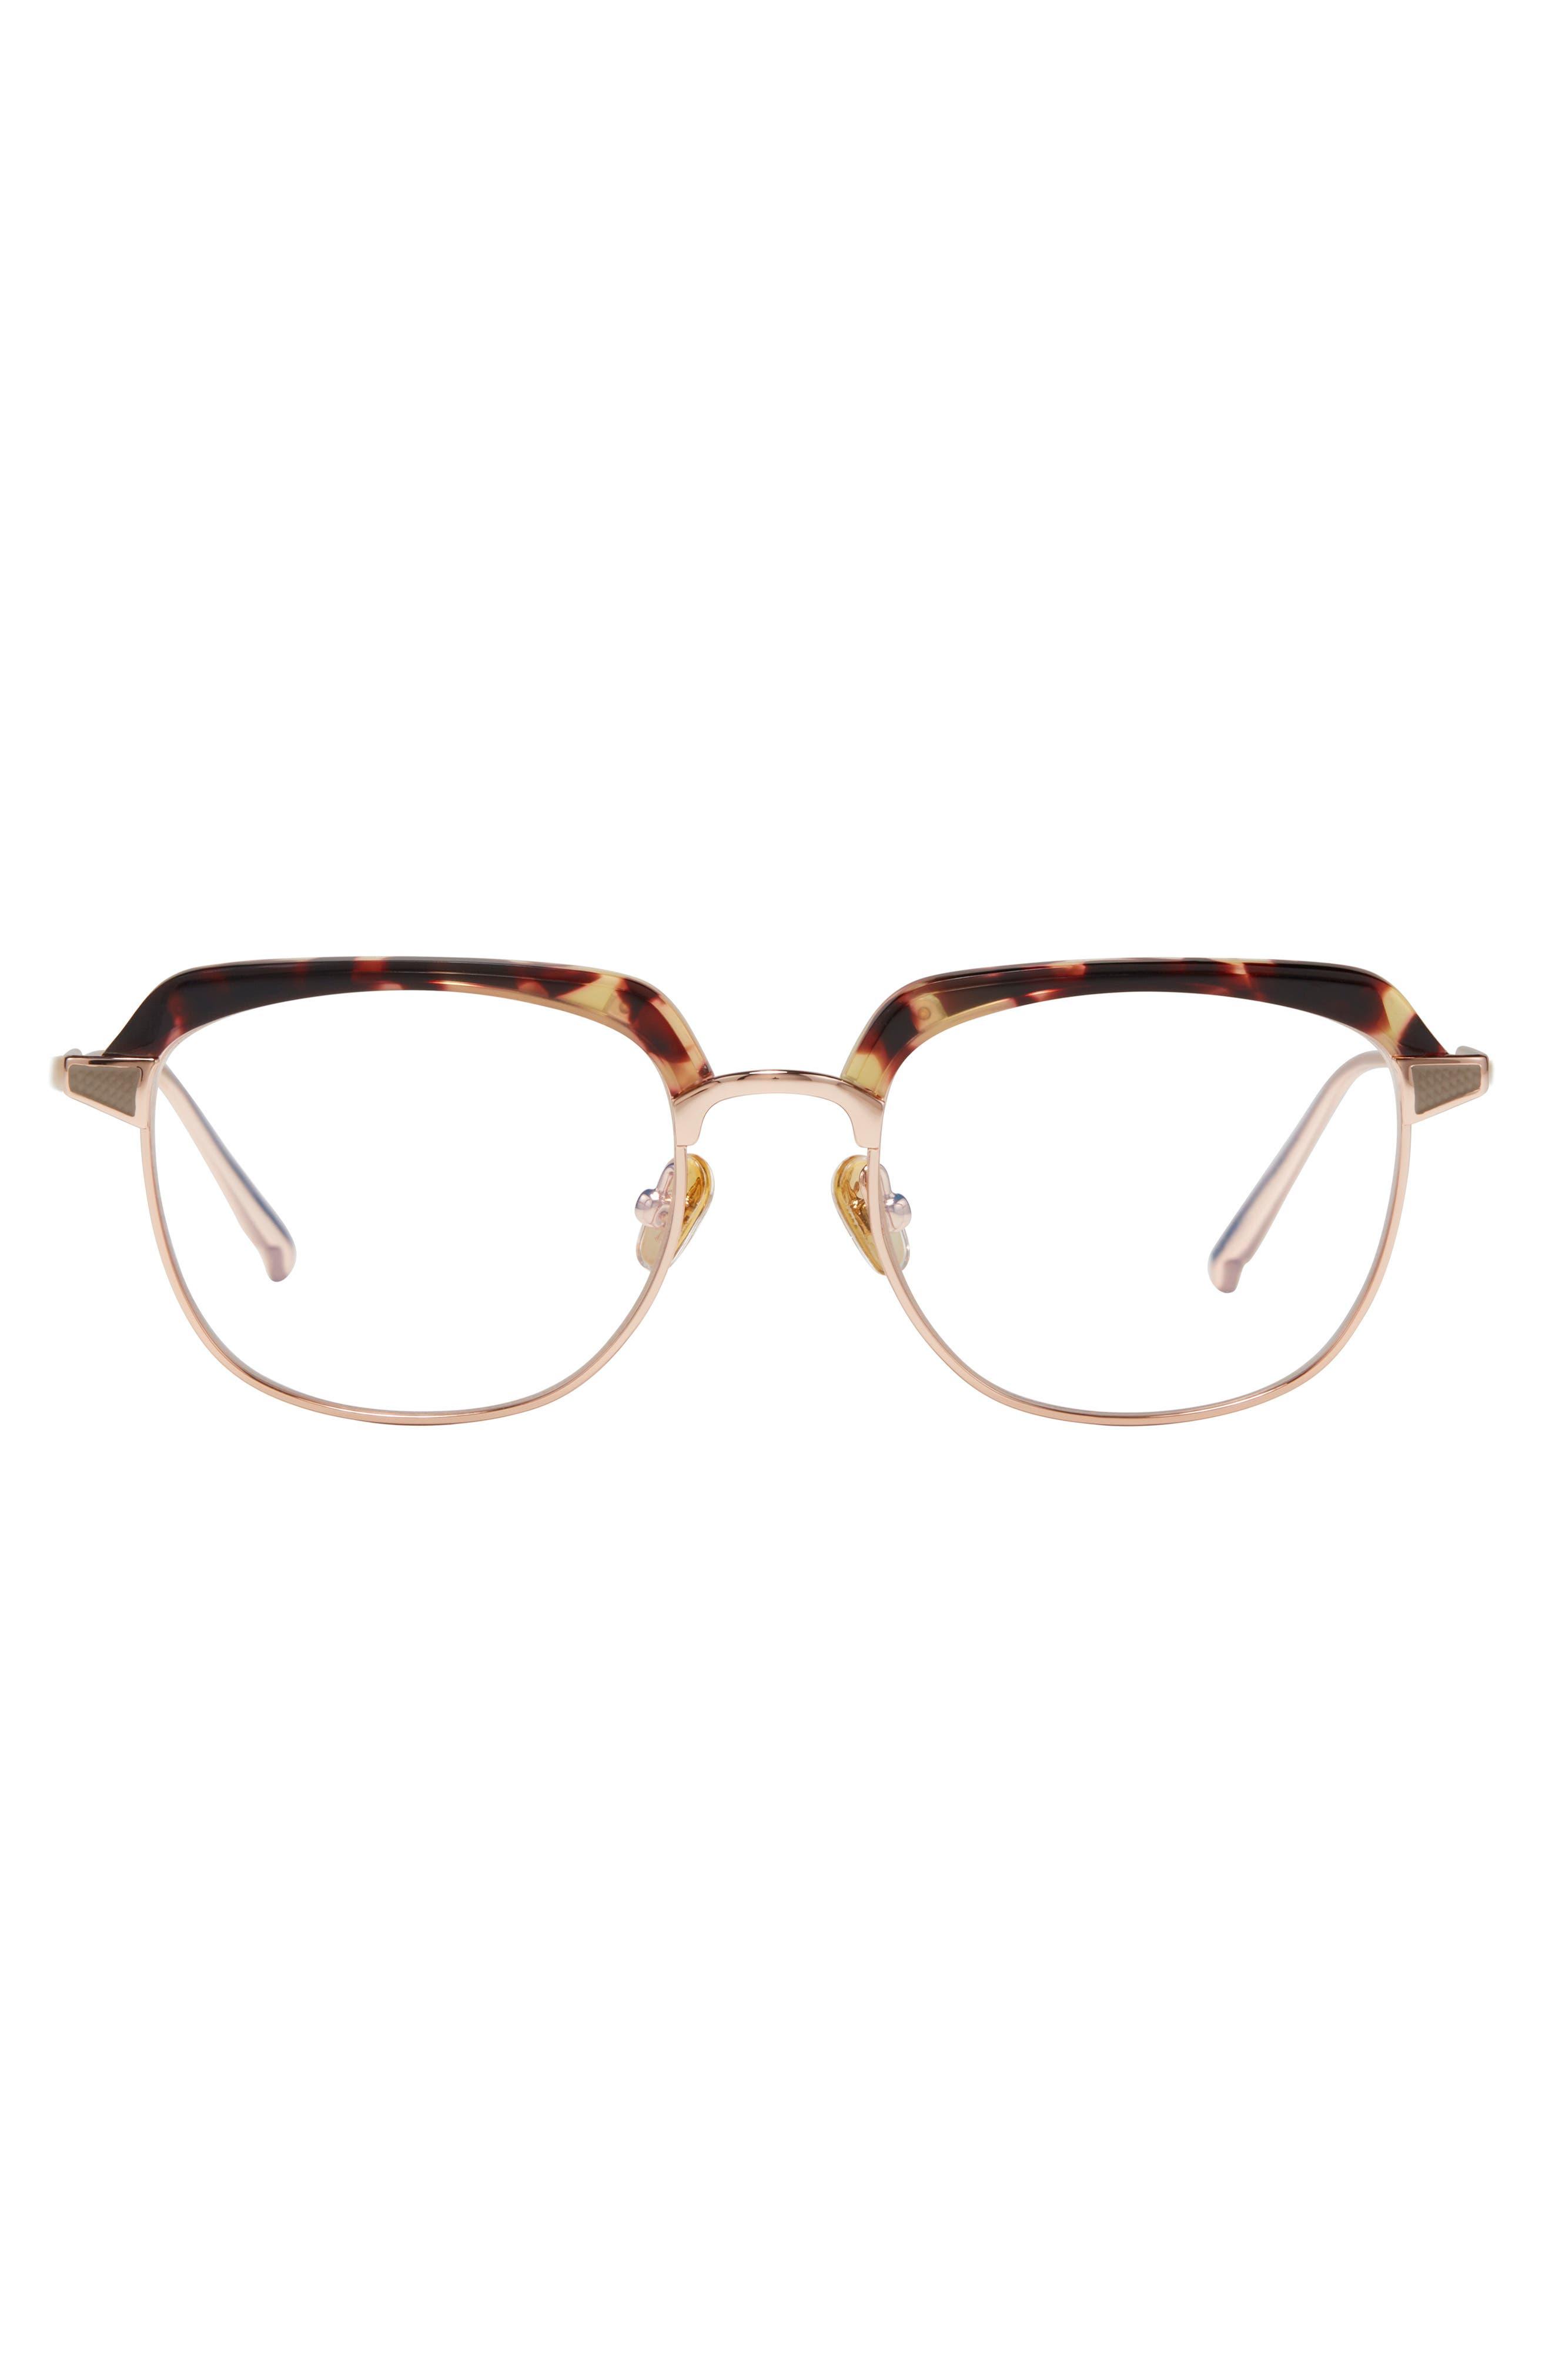 Groove 53mm Blue Light Filtering Glasses